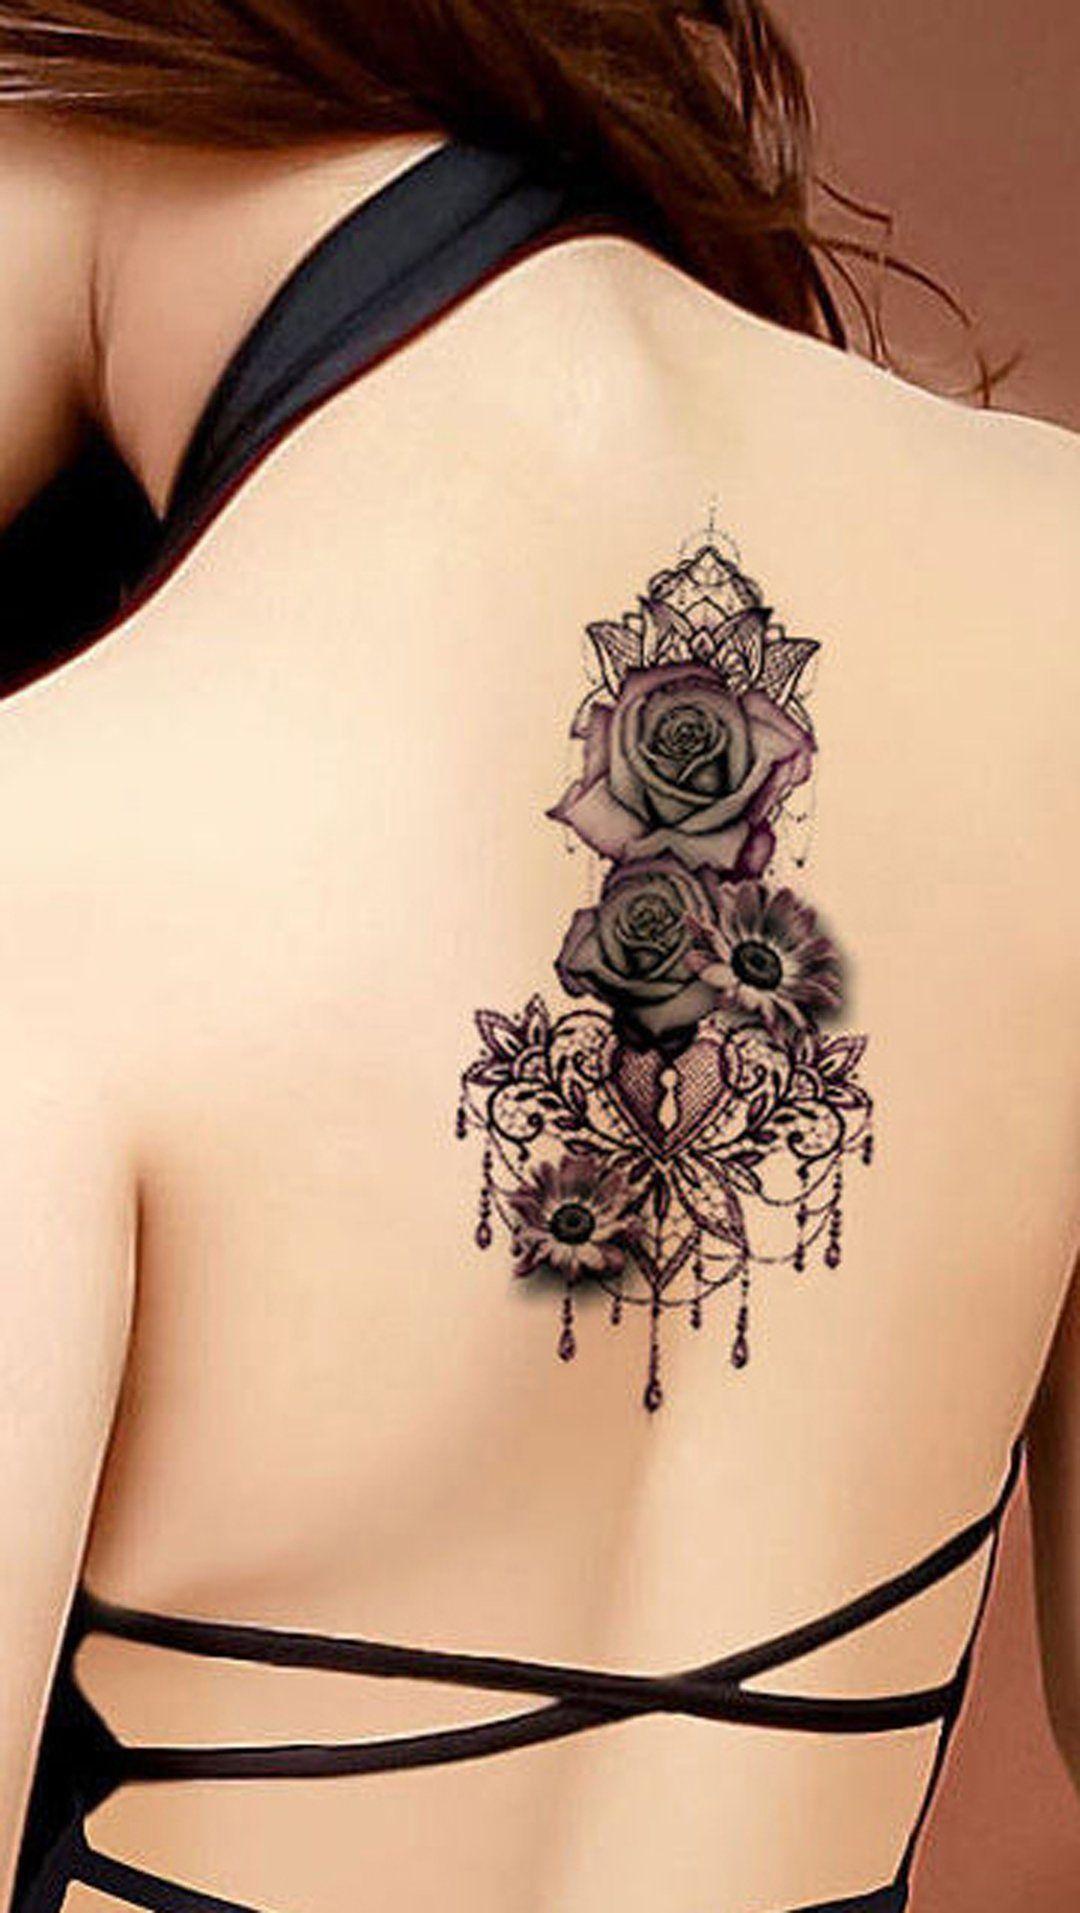 Gothic Rose Mandala Chandelier Back Tattoo Ideas For Women Traditional Vintage Cool Unique Geometric Blac Half Sleeve Tattoo Sleeve Tattoos Tattoos For Women